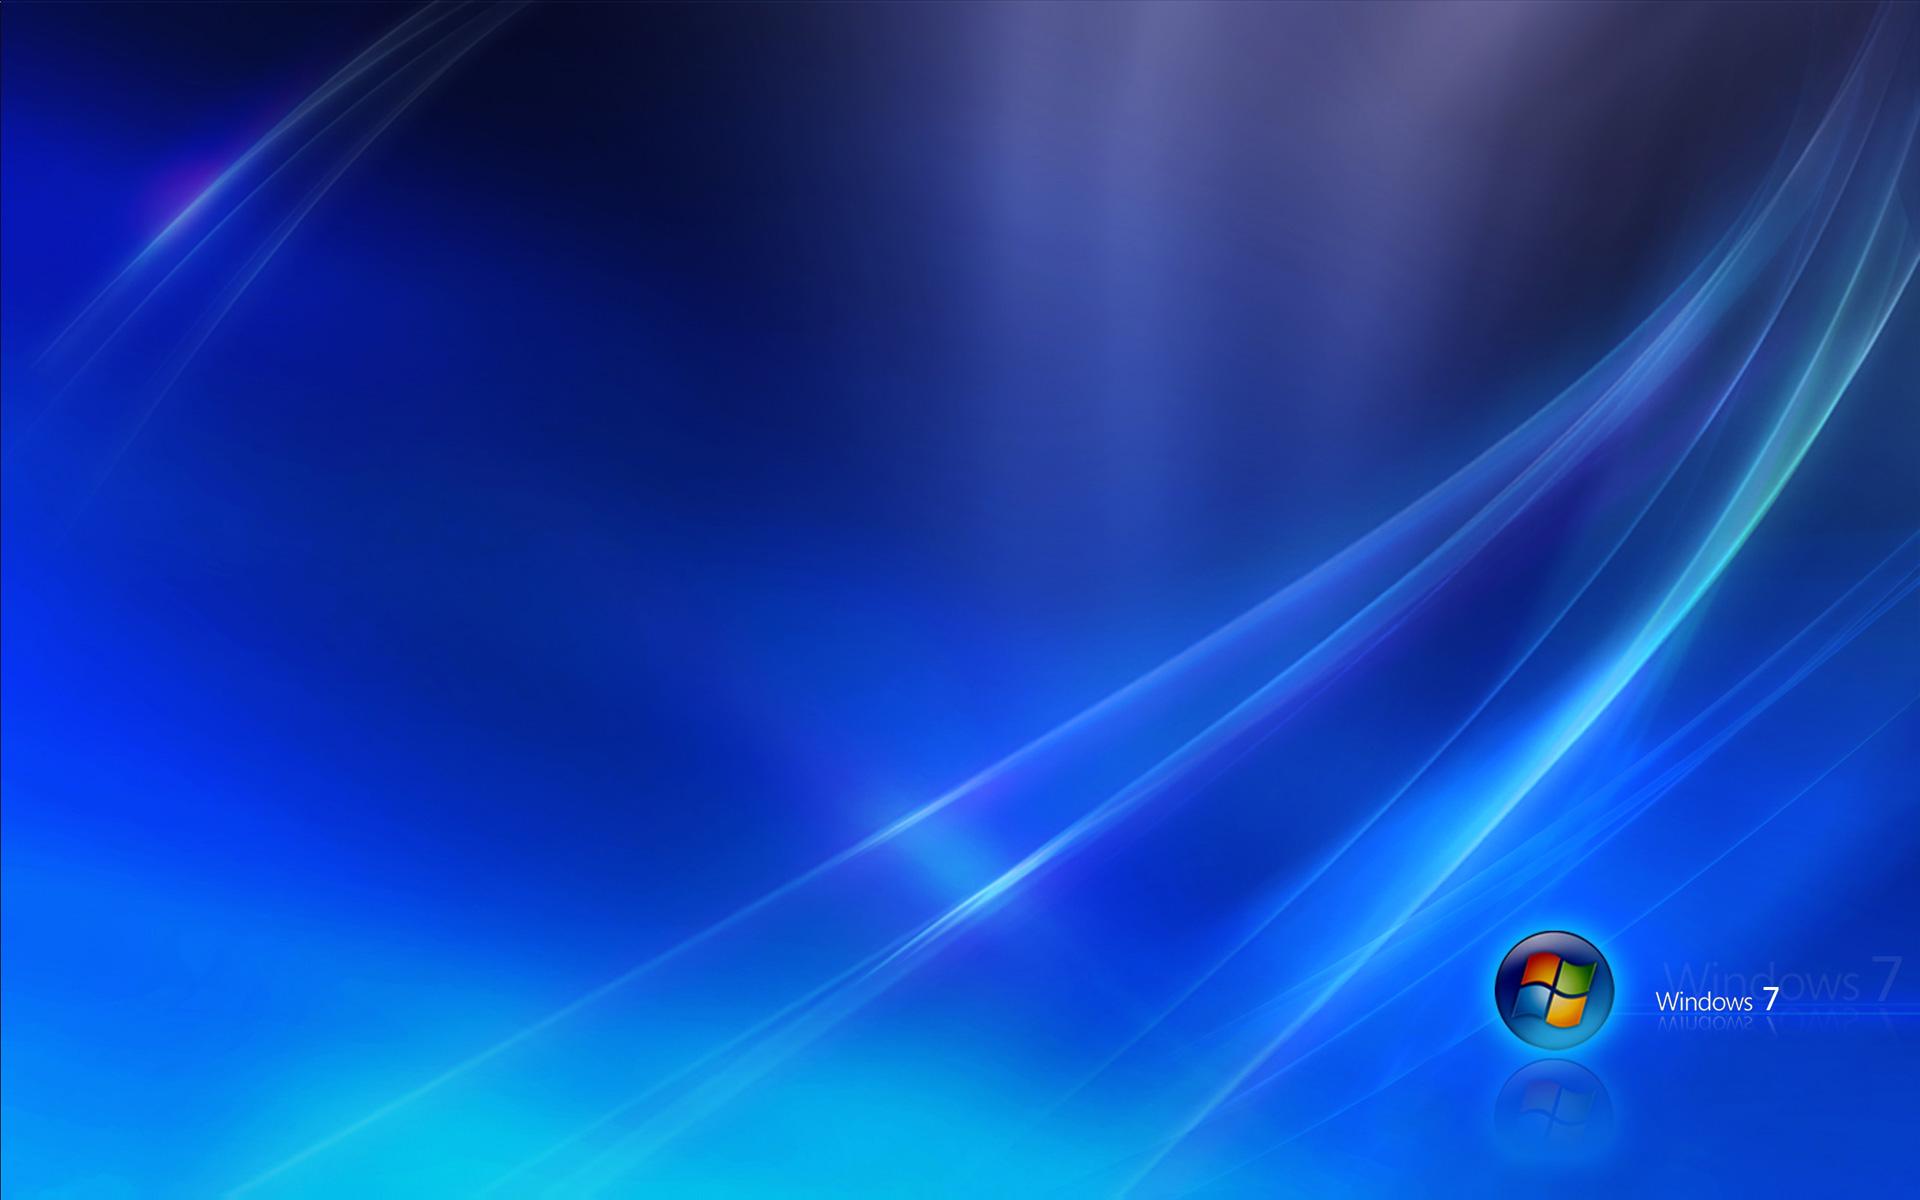 50] Windows Desktop Backgrounds Windows 7 on WallpaperSafari 1920x1200